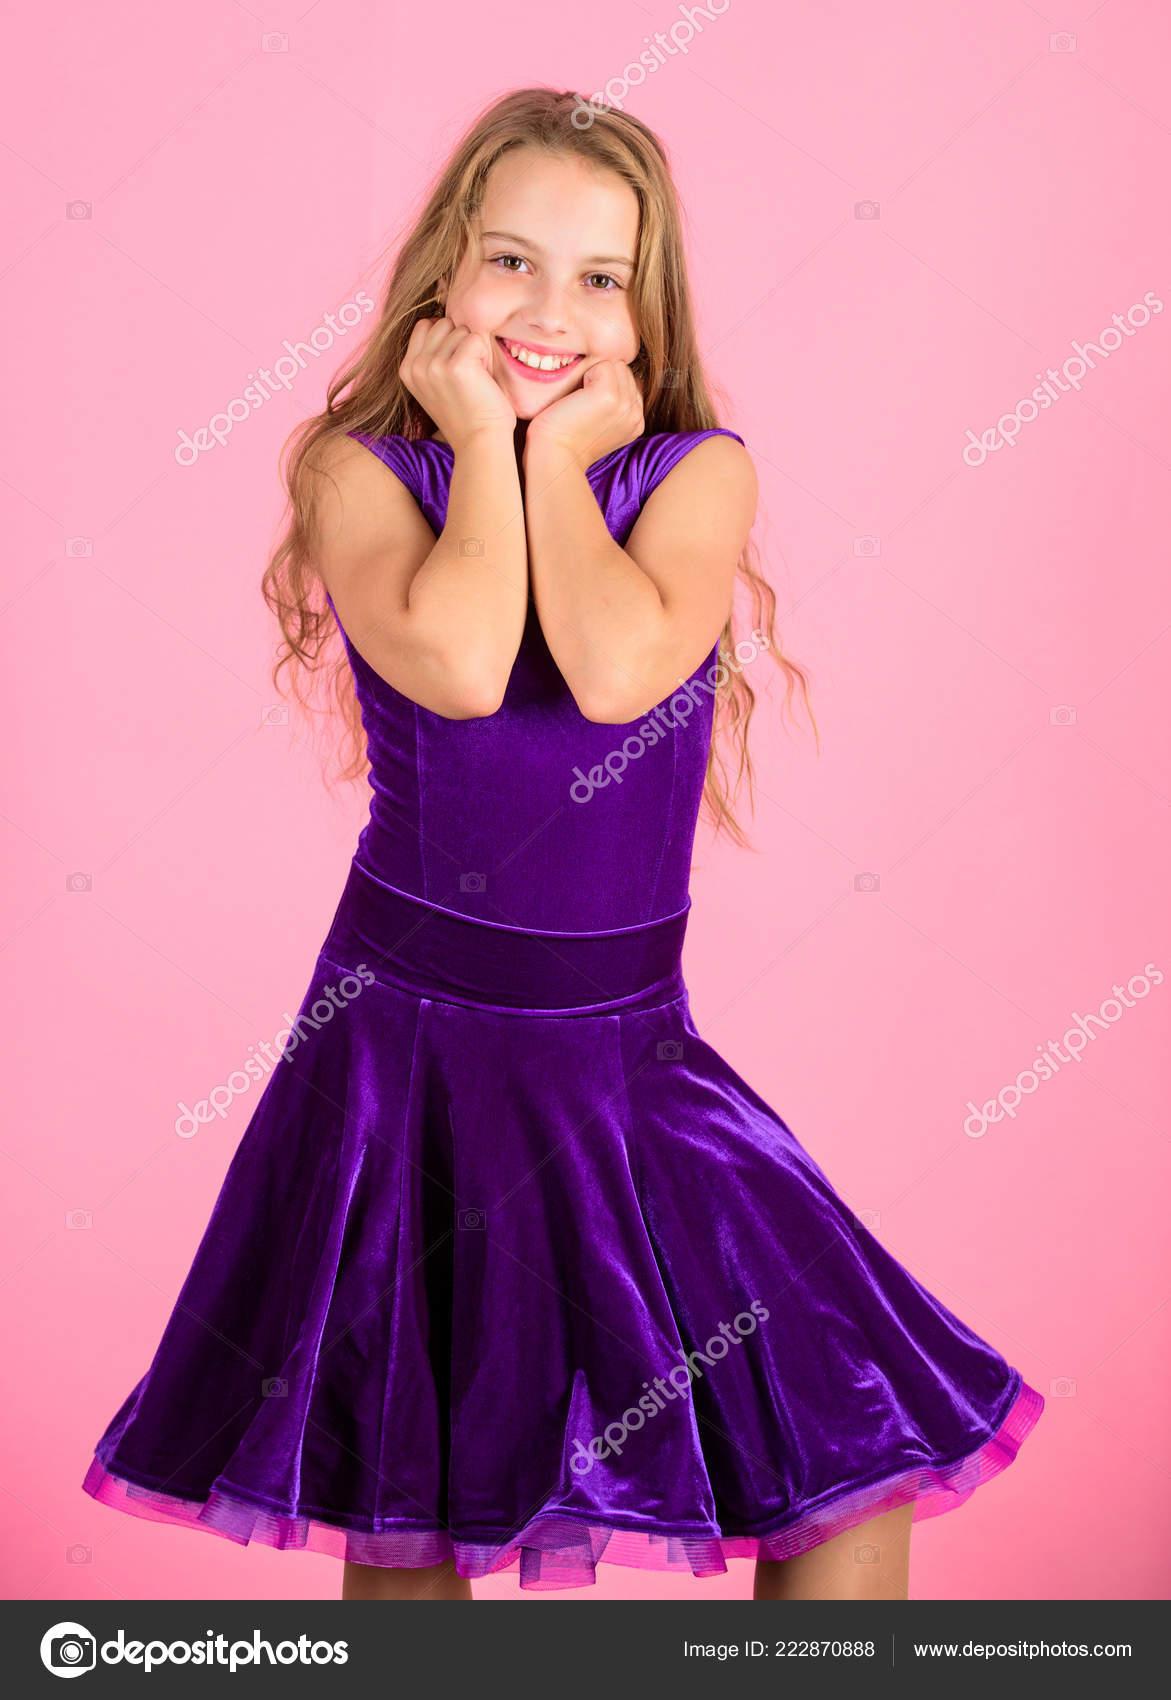 e7ed15f126 Ropa para baile de salón. Concepto de moda de ropa de baile de salón.  Bailarín chico satisfecho con traje de concierto. Moda de niños.